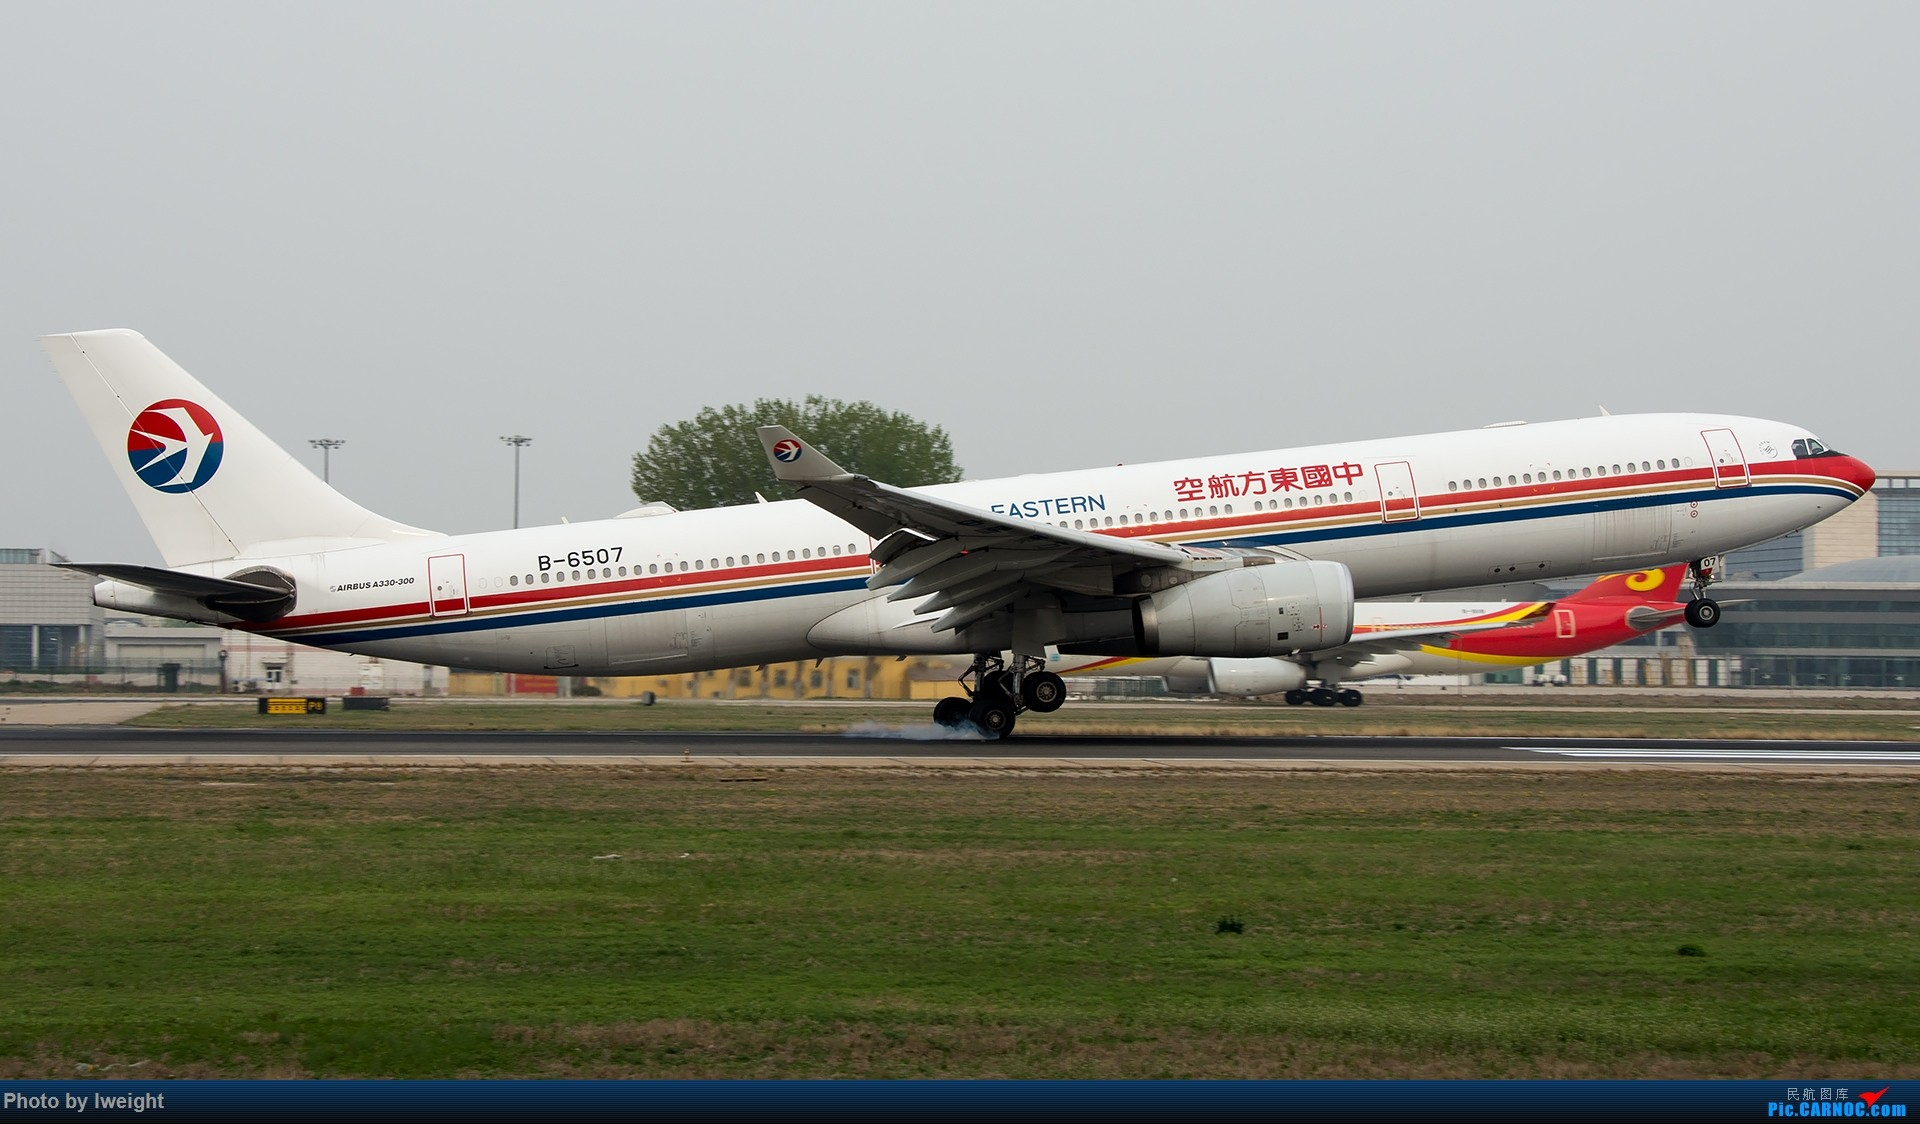 Re:[原创]霾,18R,高密度 AIRBUS A330-300 B-6507 中国北京首都国际机场